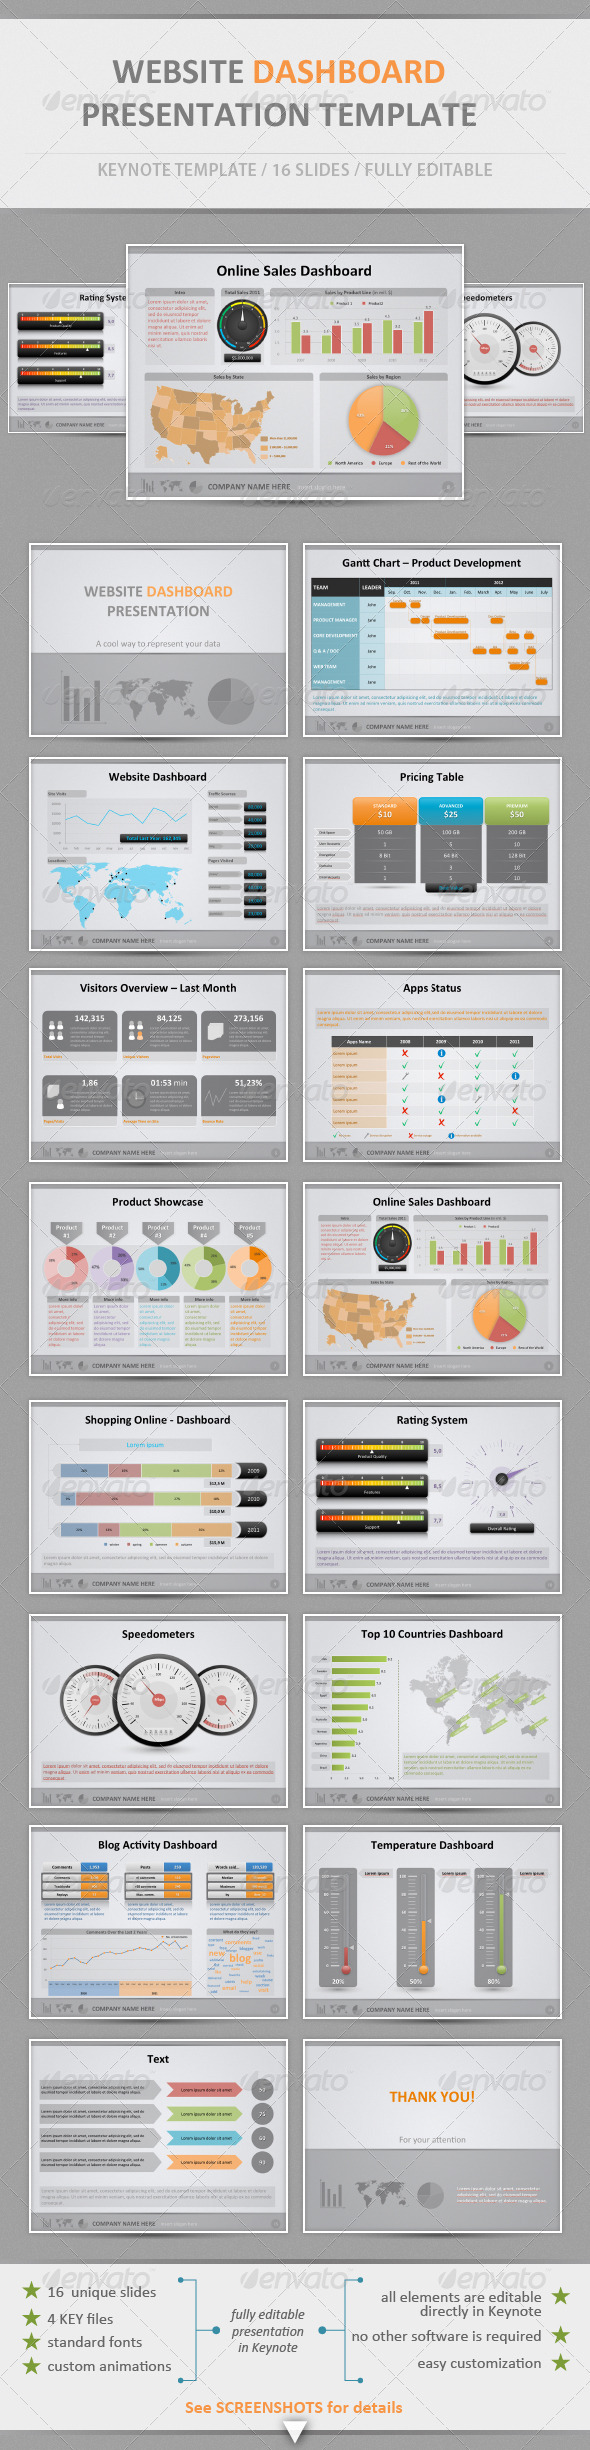 Website Dashboard Presentation Template - Keynote Templates Presentation Templates